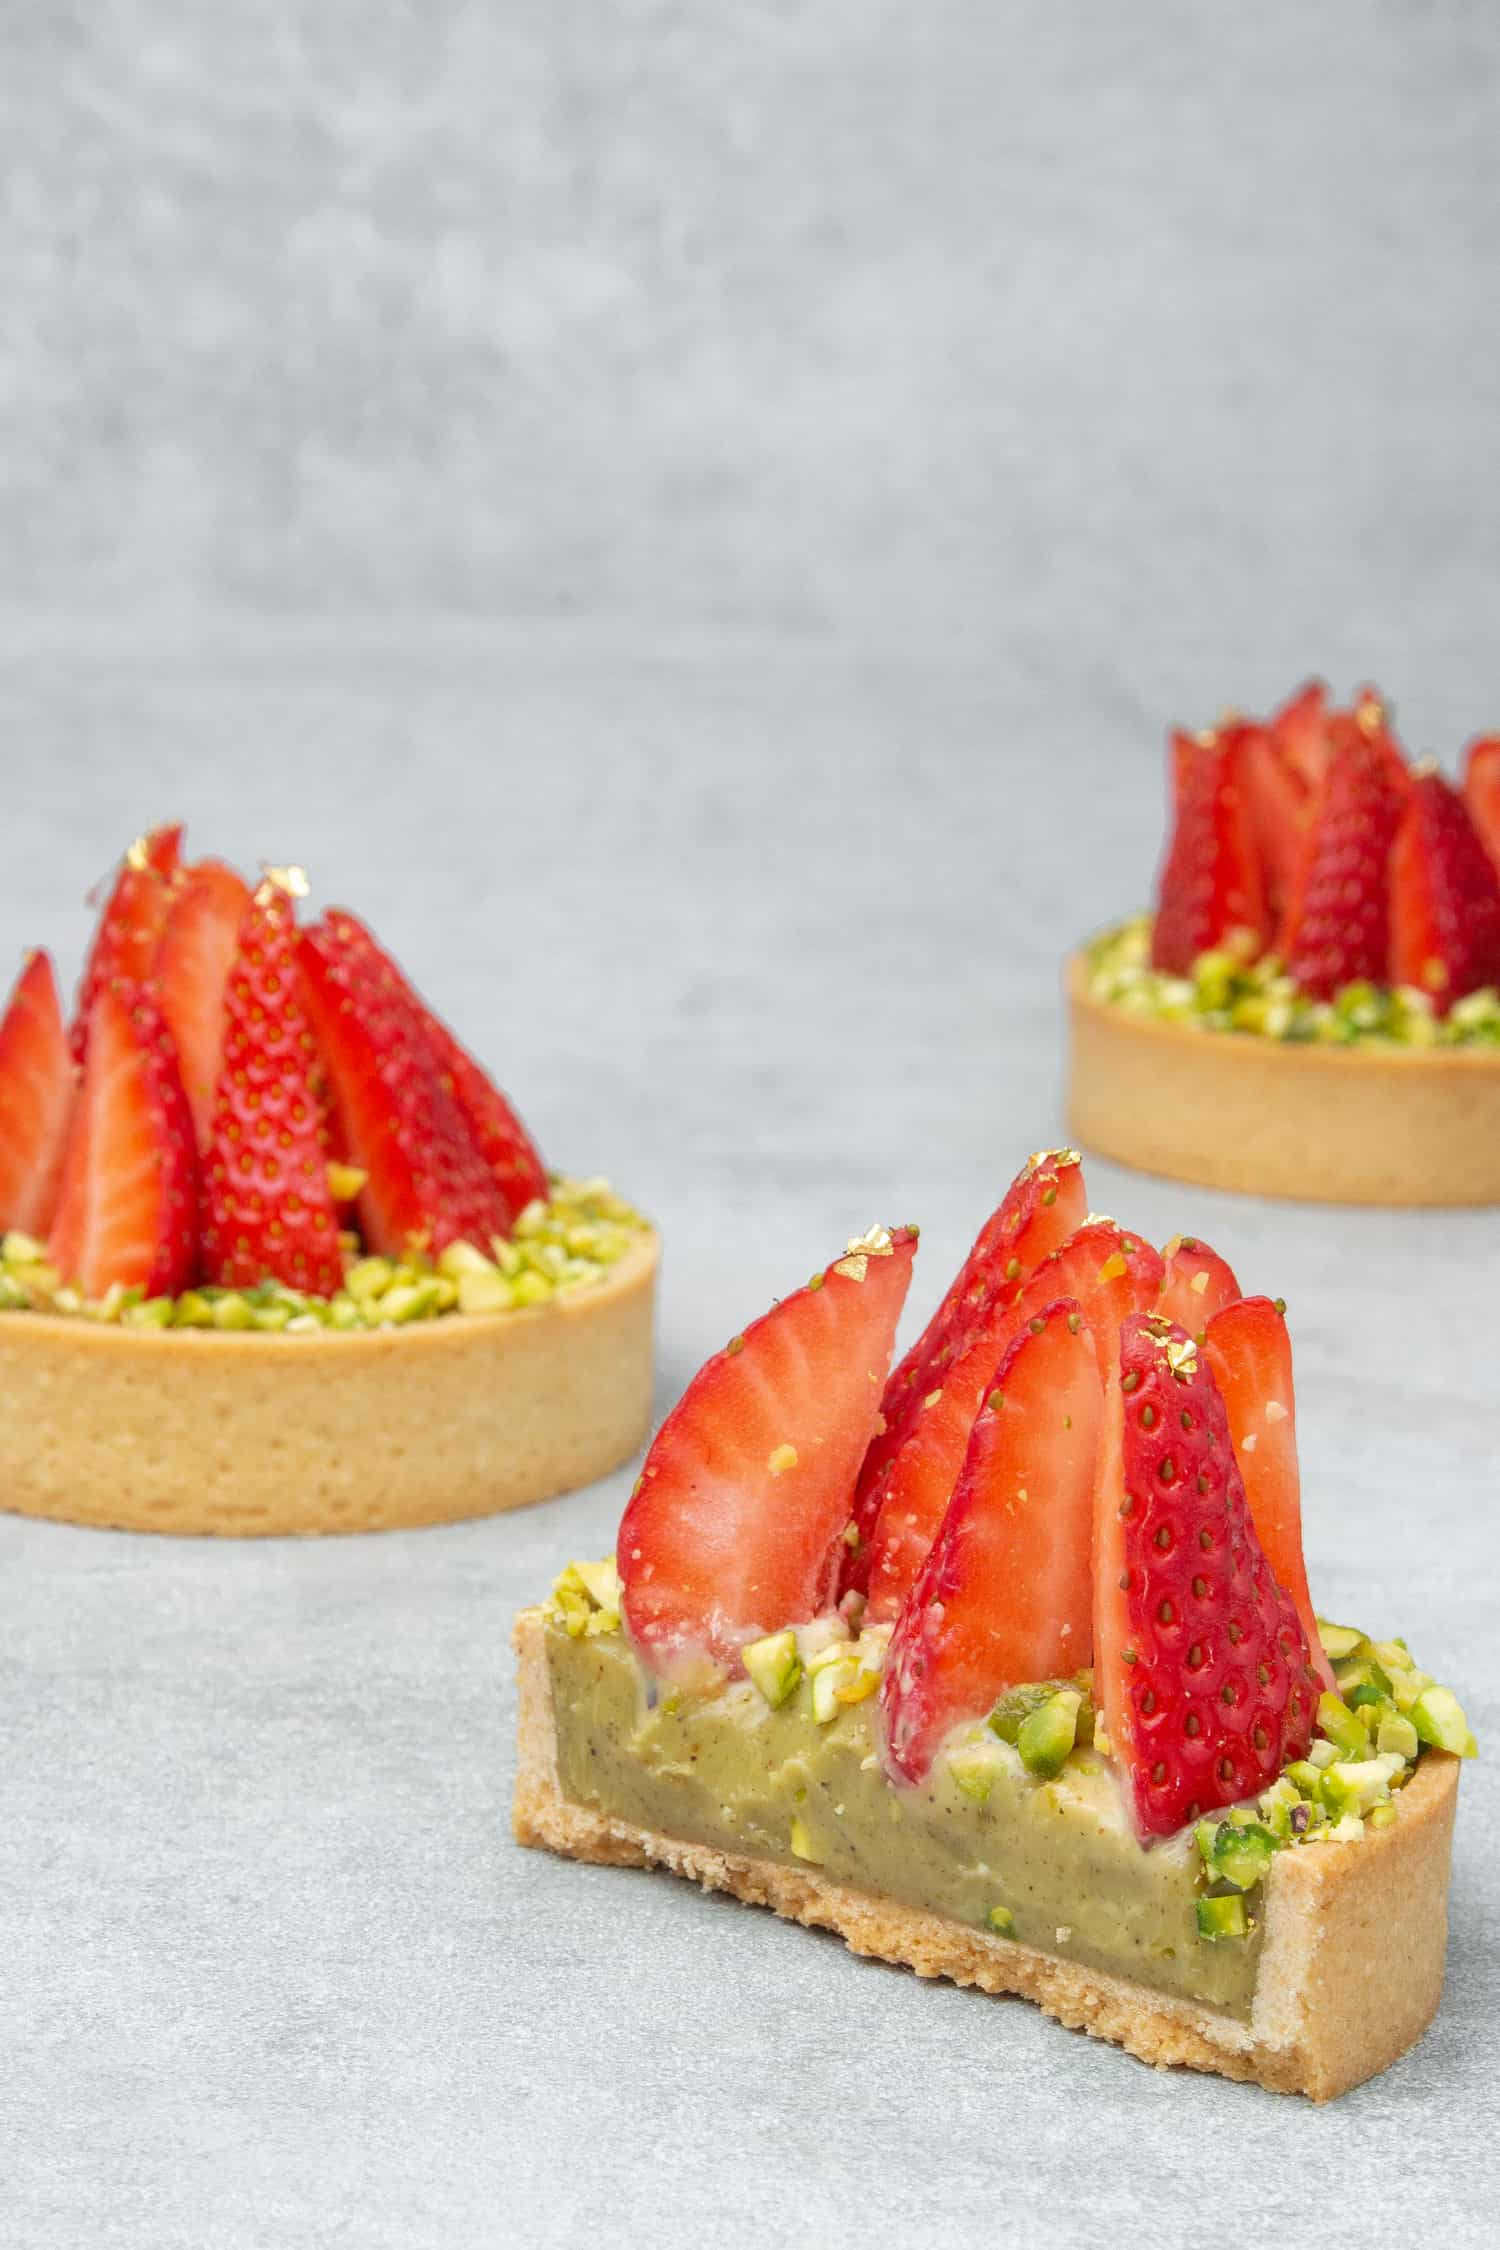 Strawberry Pistachio tart